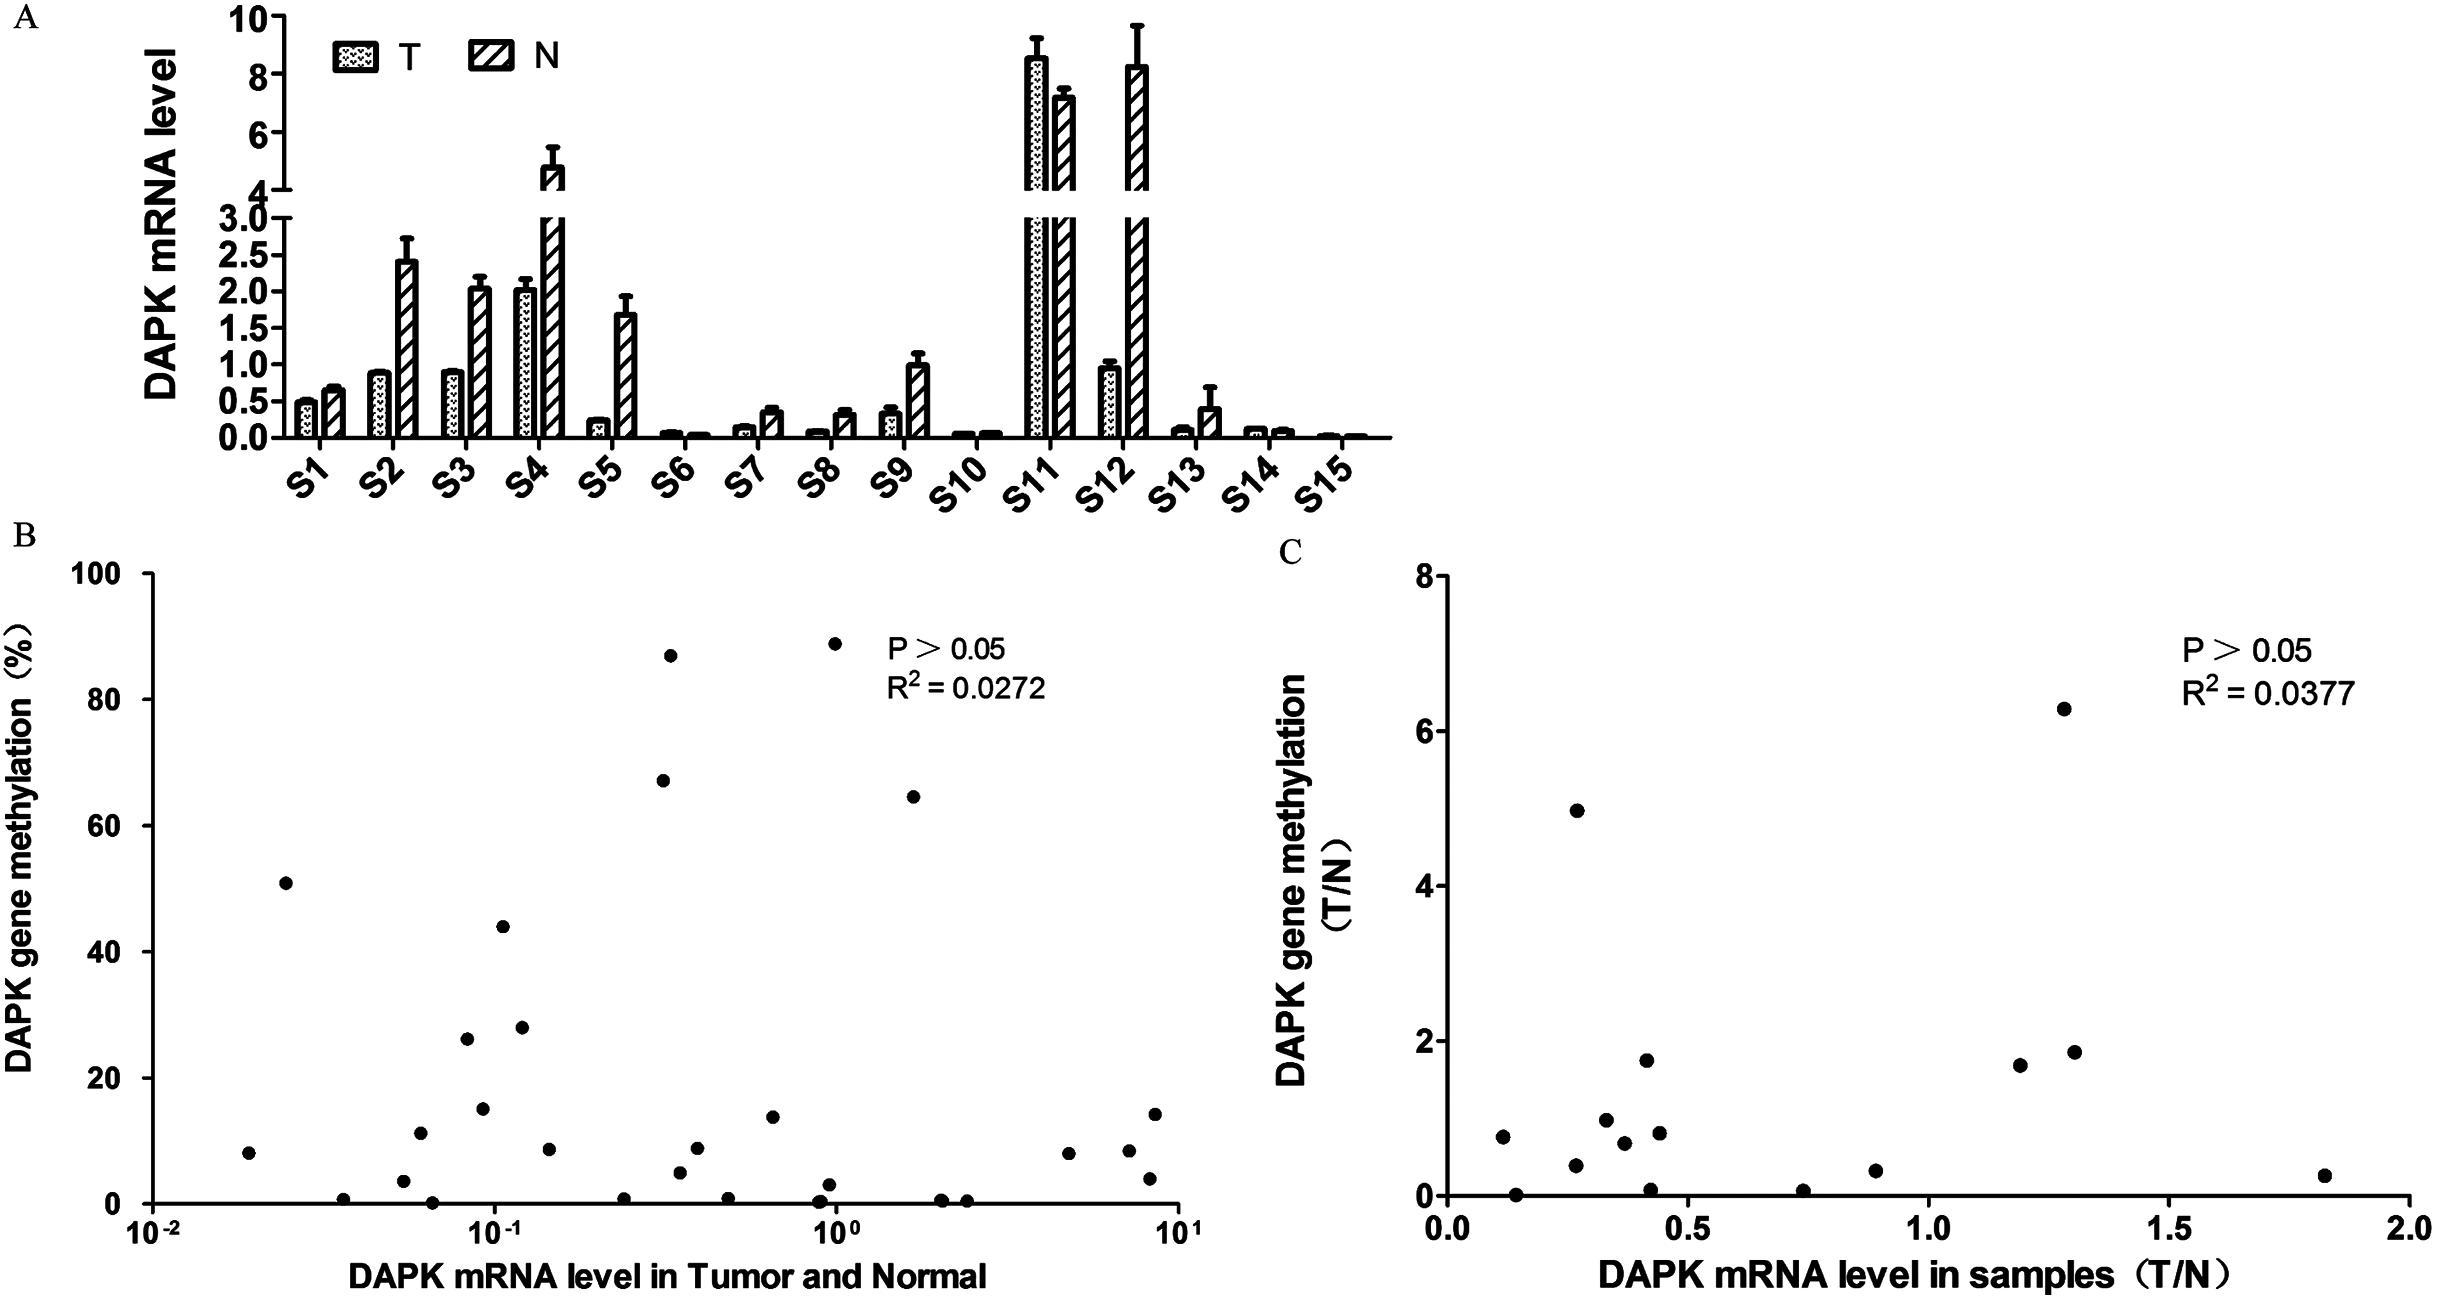 Quantitative and correlation analysis of the DNA methylation